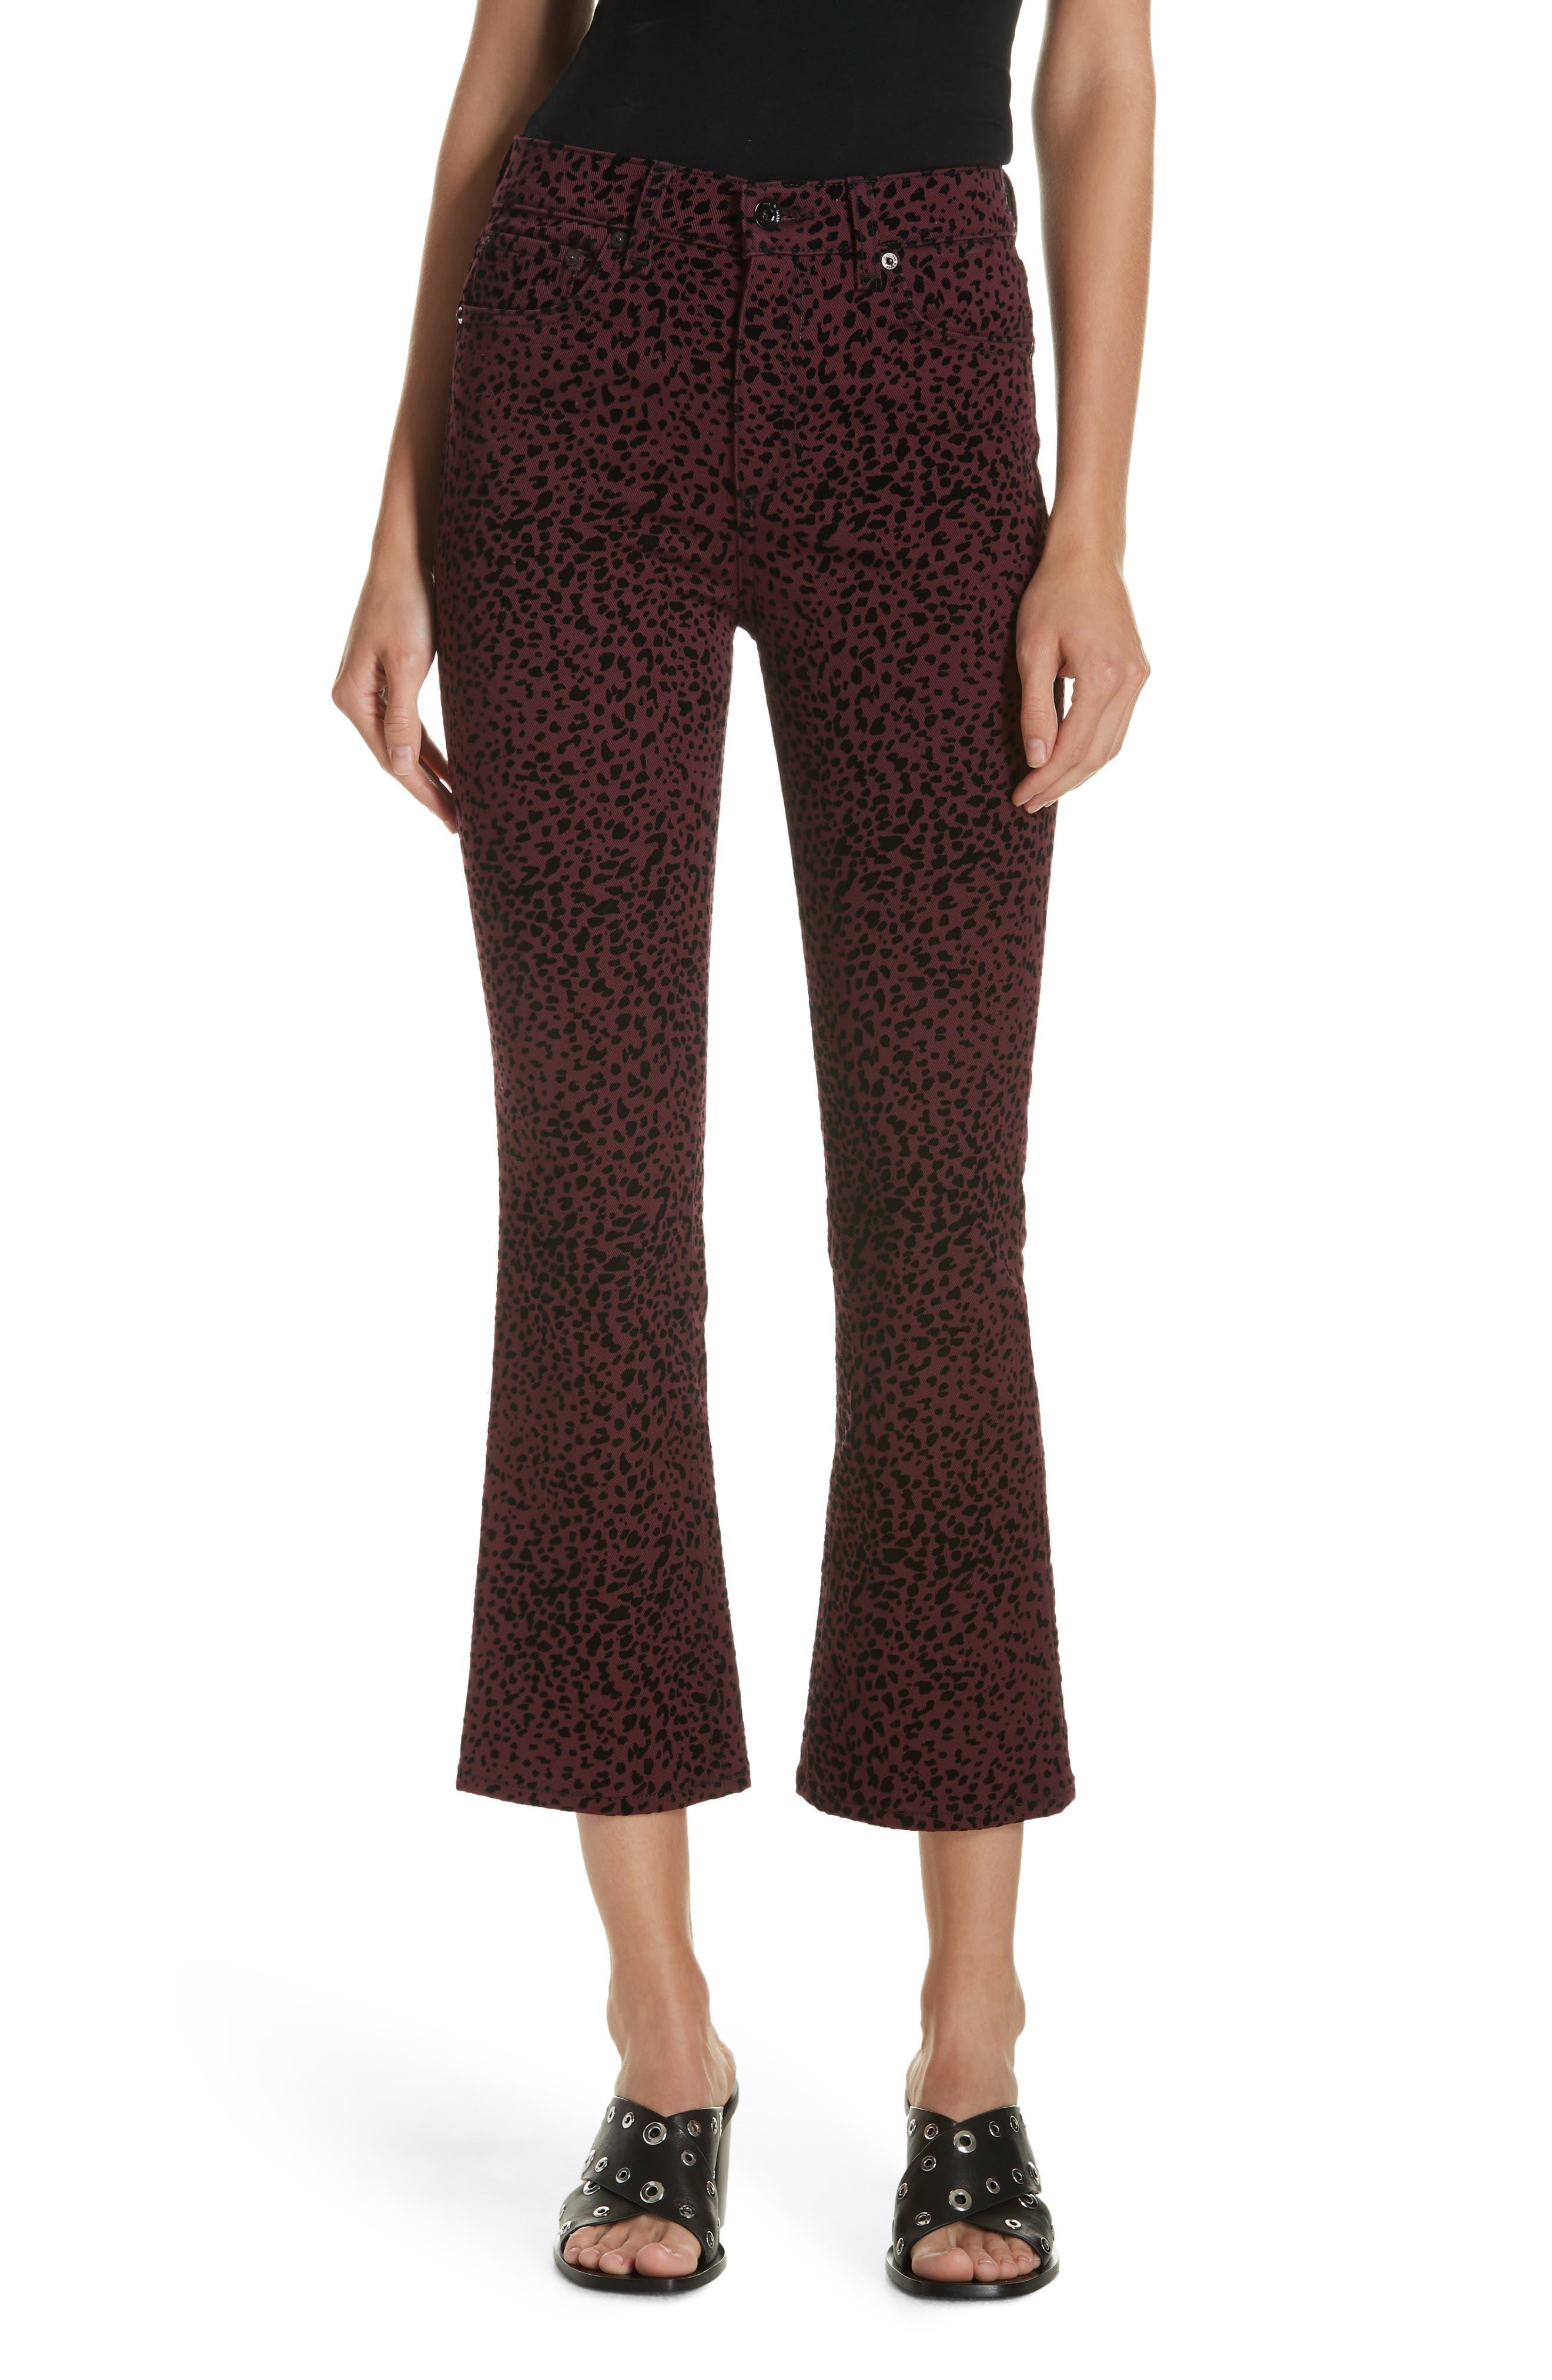 Hana High Waist Crop Flare Jeans,                             Main thumbnail 1, color,                             930